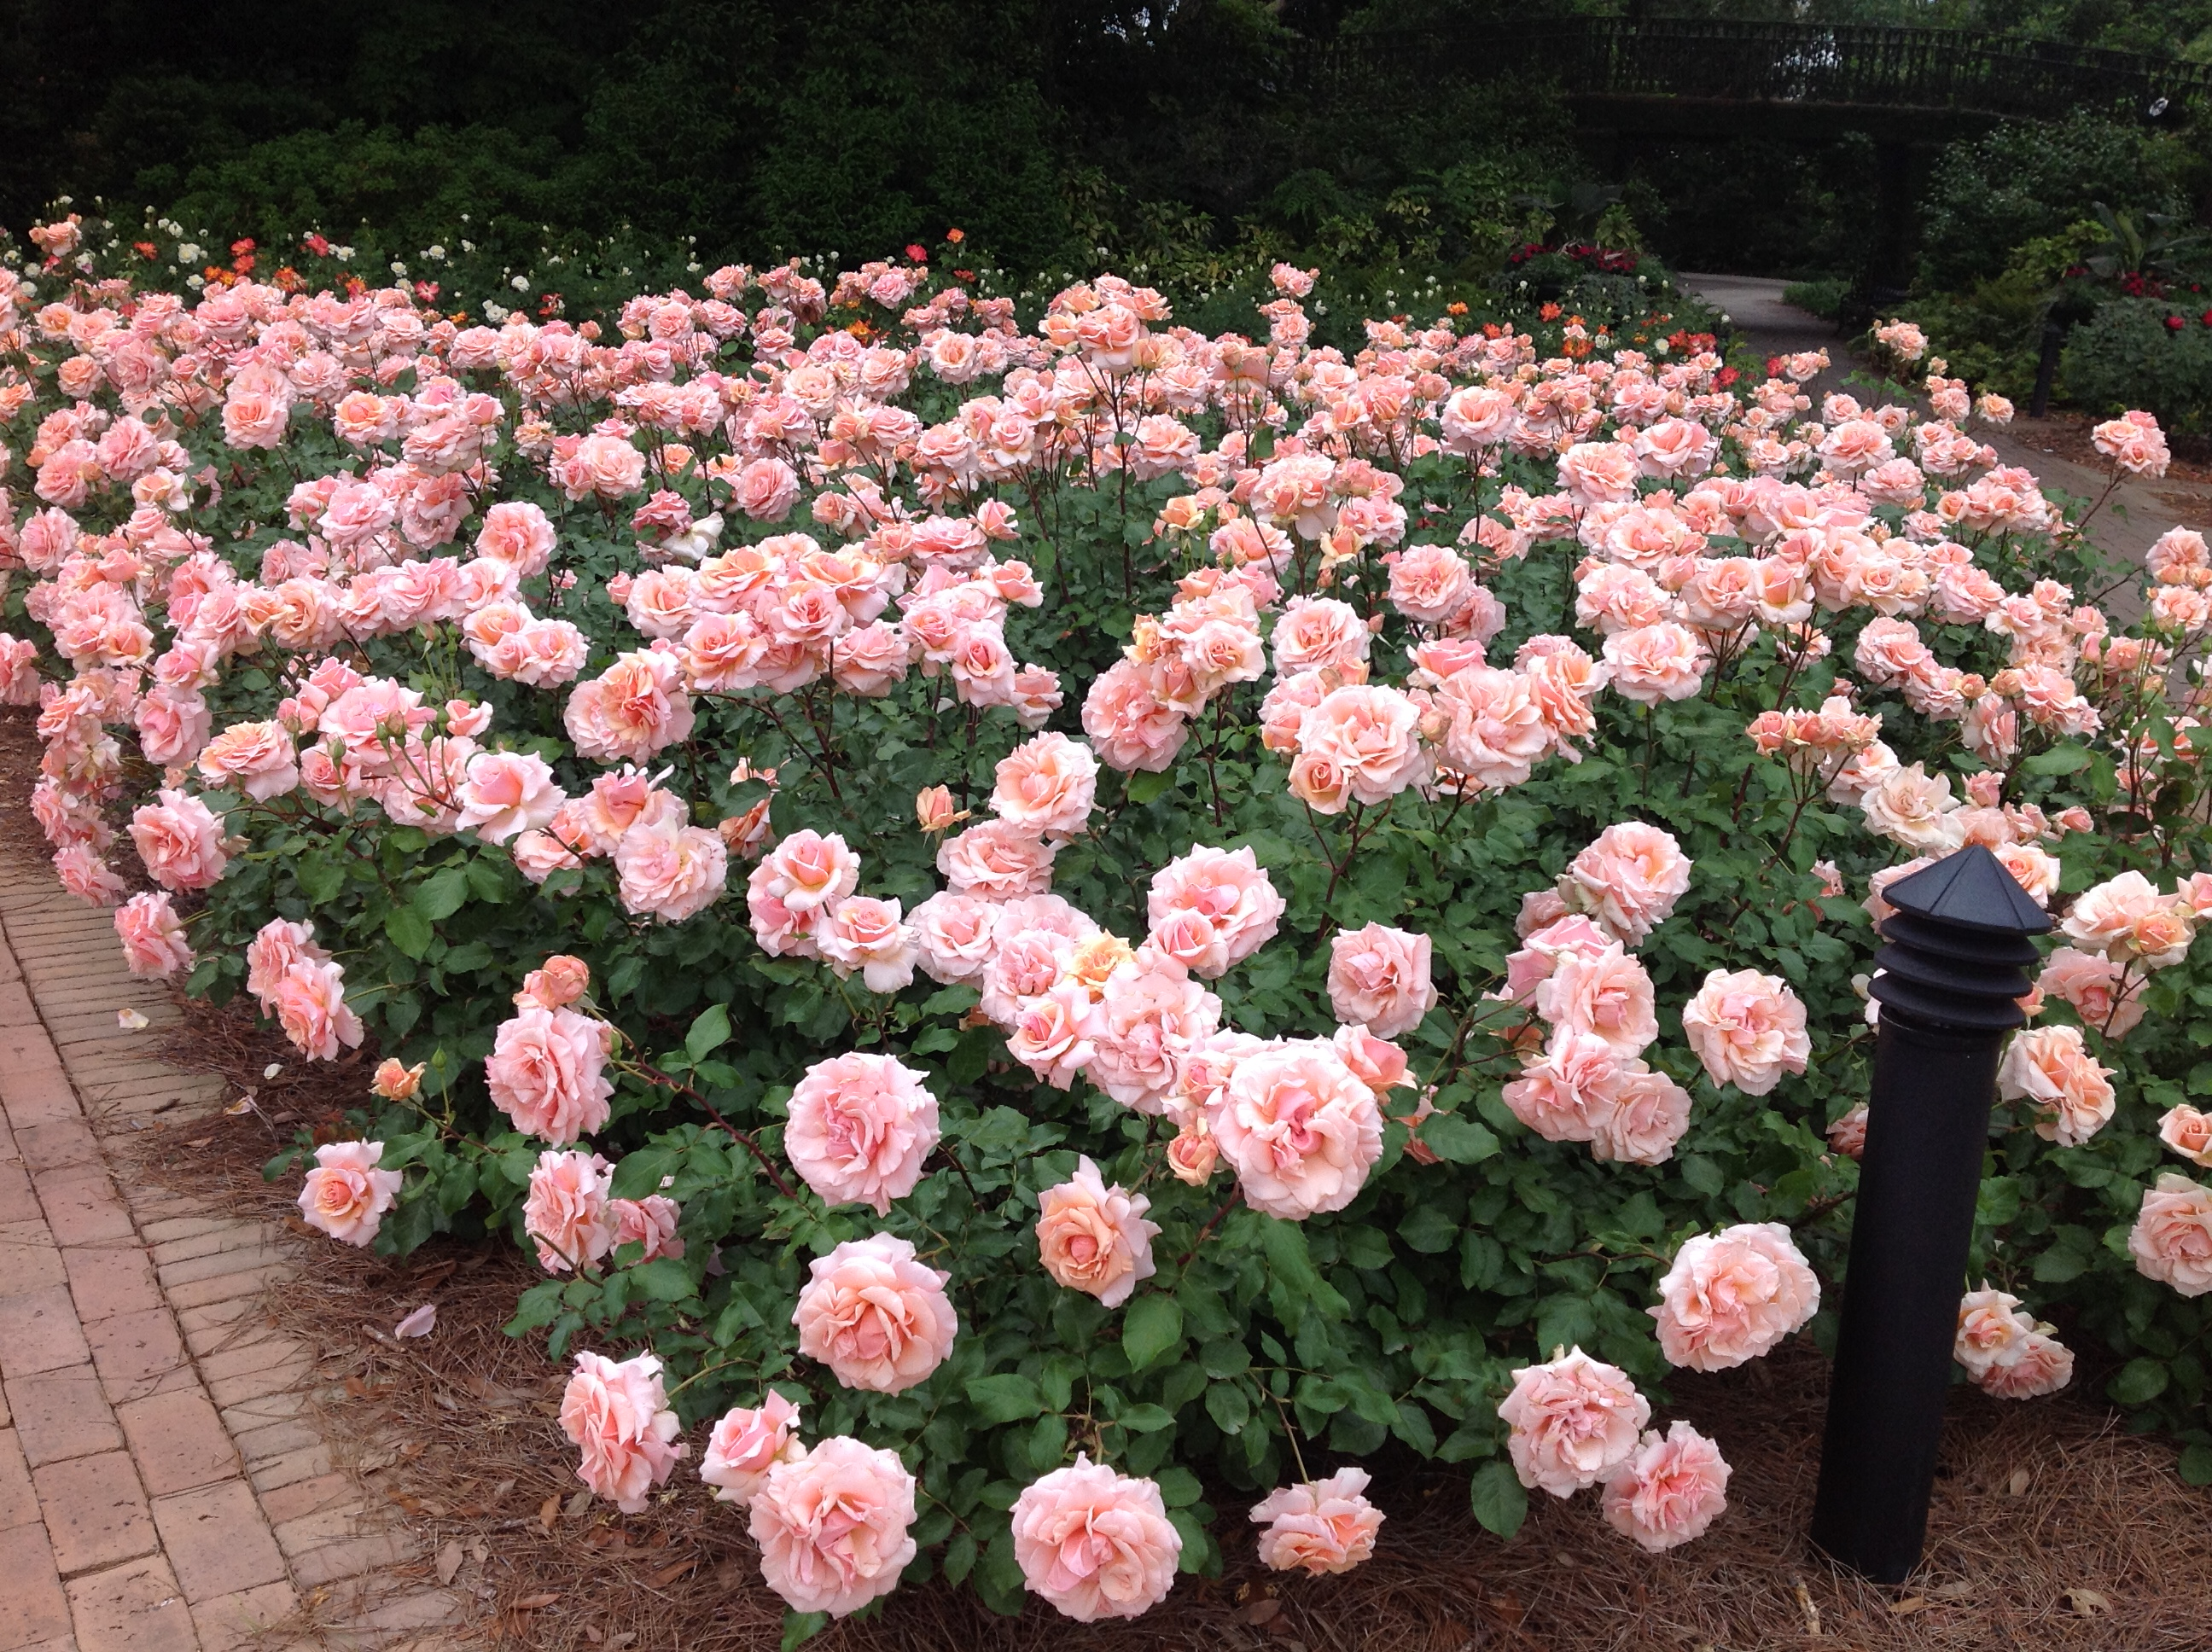 Delightful Planting A Rose Garden Tips For Planting A Disease Resistant Rose  Garden: